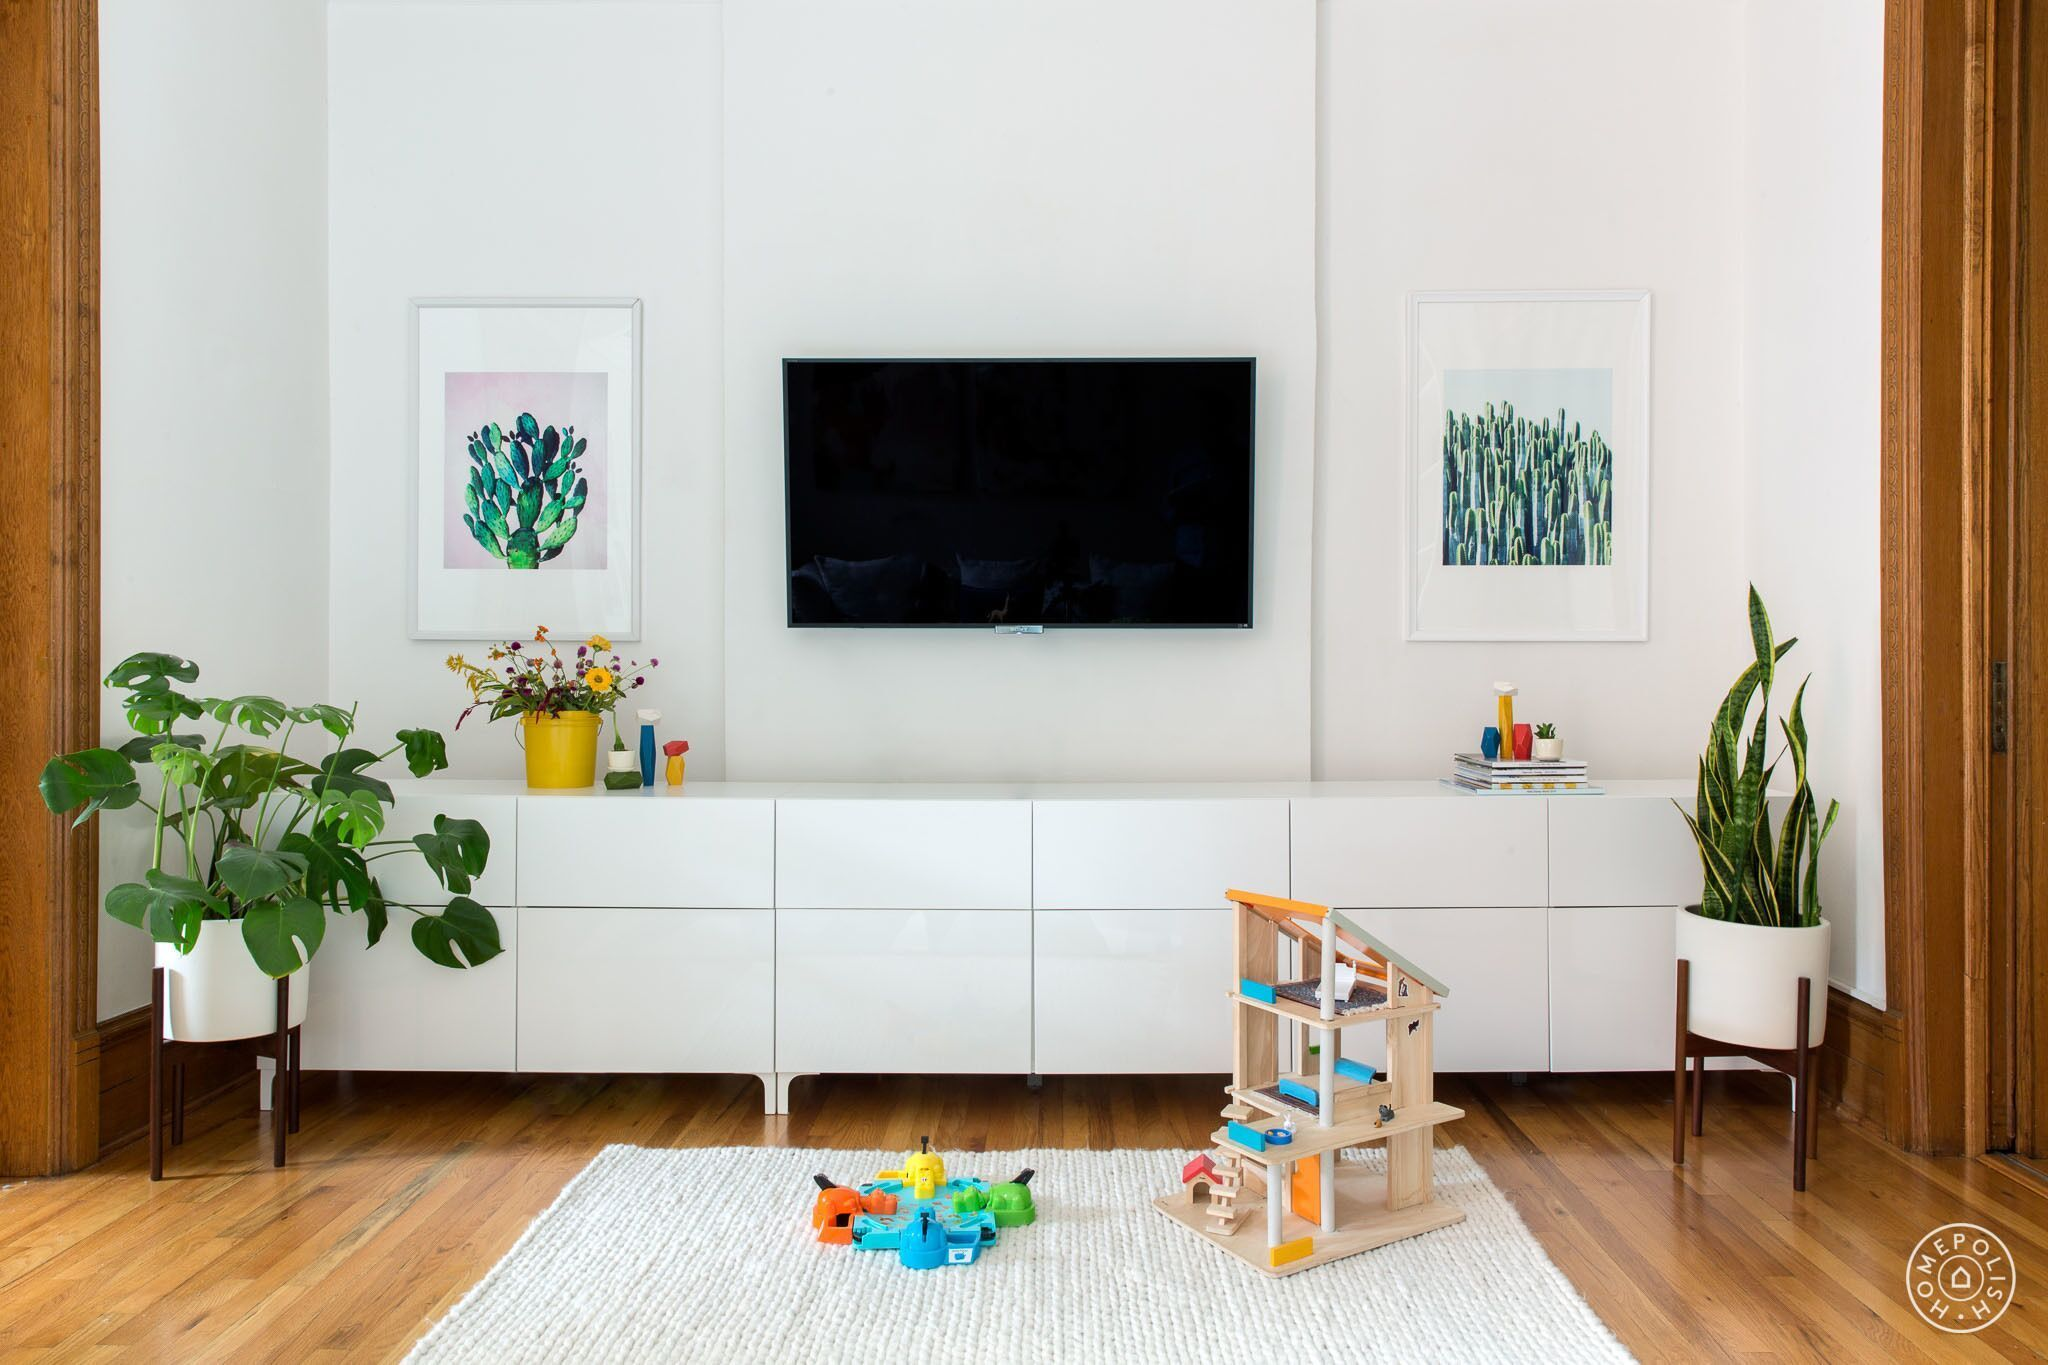 Homepolish Designer Ana Claudia Schultz Helped Design A Brooklyn Brownstone